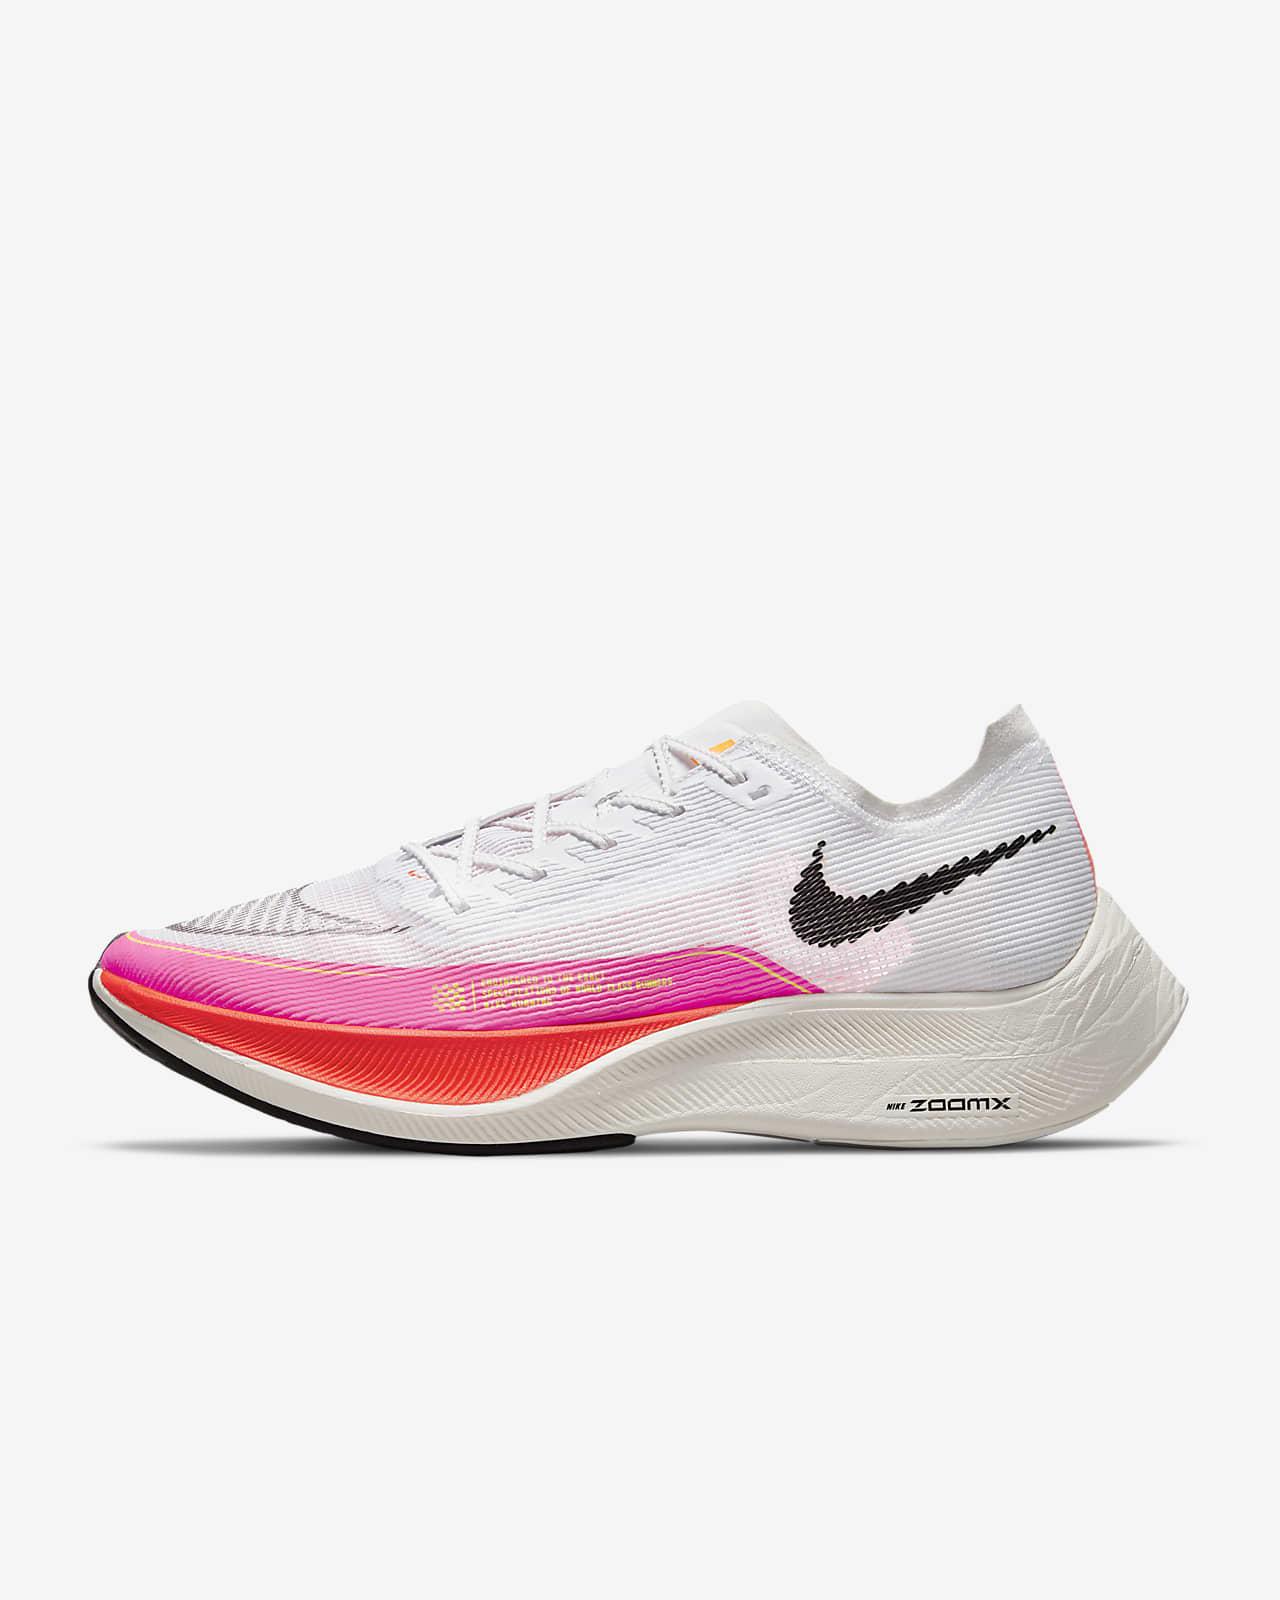 Nike ZoomX Vaporfly Next% 2 男款路跑競速鞋